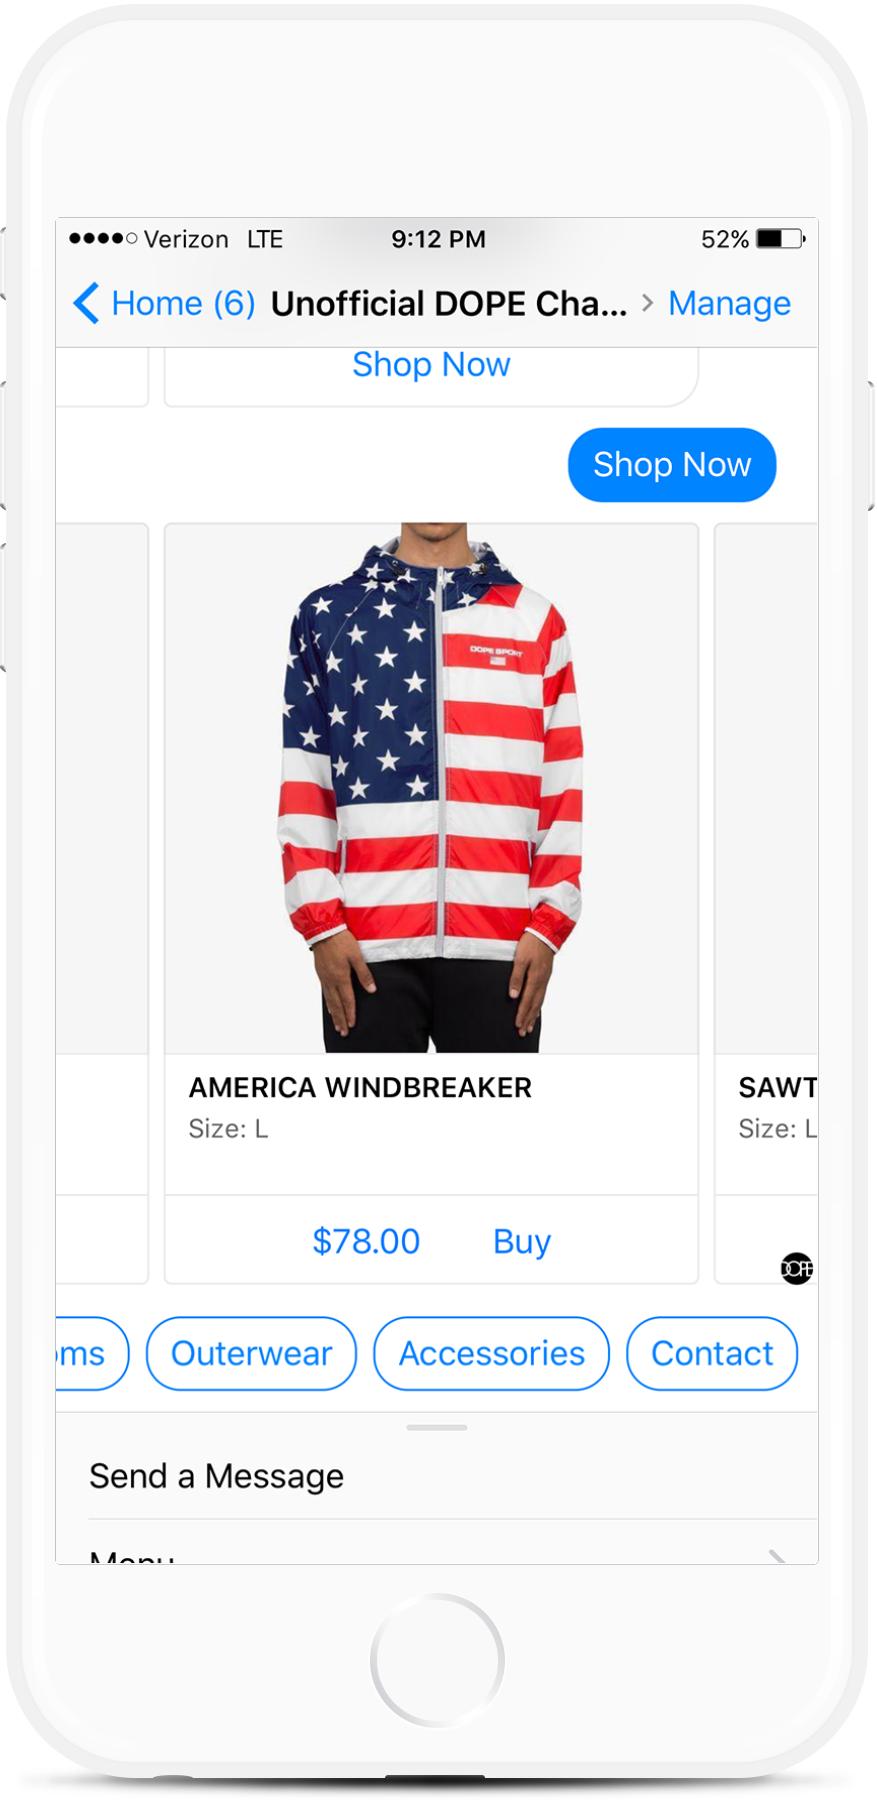 Facebook Messenger Chatbot for Clothing Retailers for $29   #messenger #bottemplates #bots #chatbots #aibots #fbmessenger #botmakers